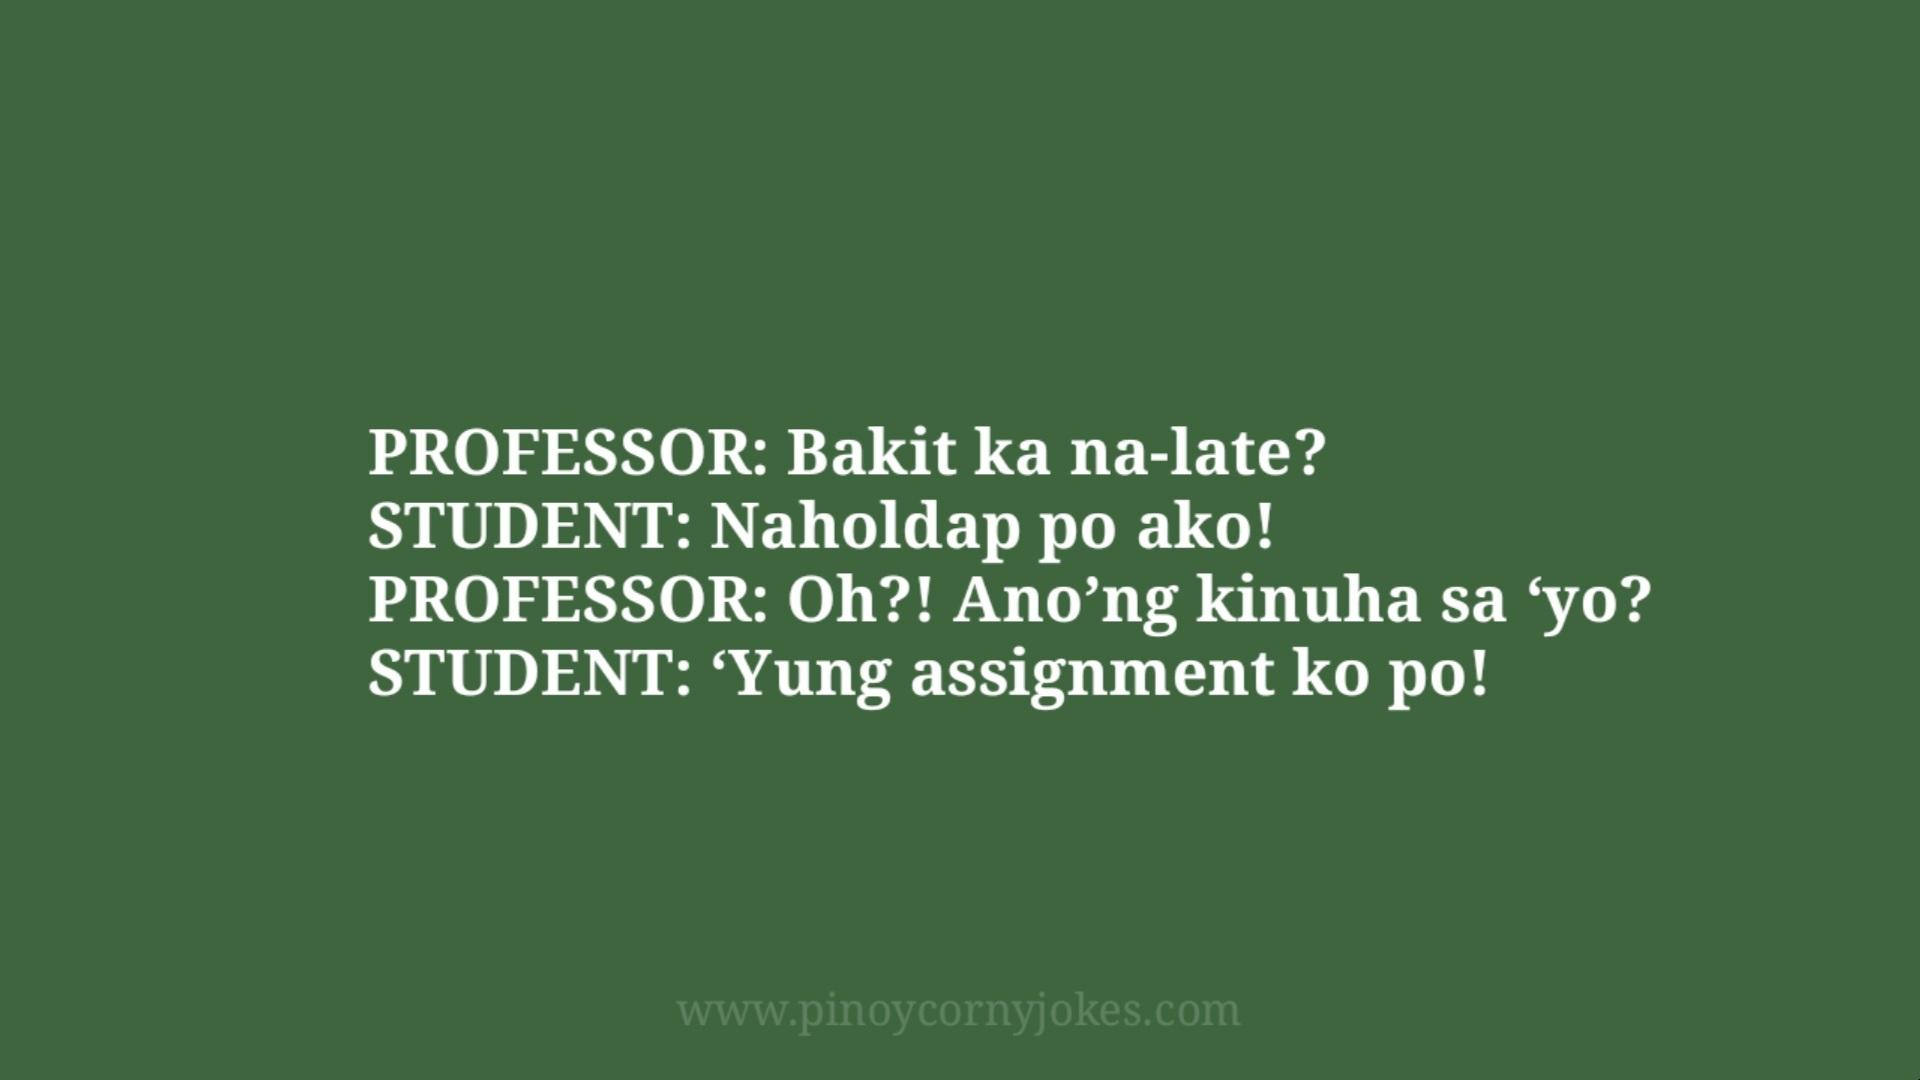 naholdap nalate teacher student pinoy jokes